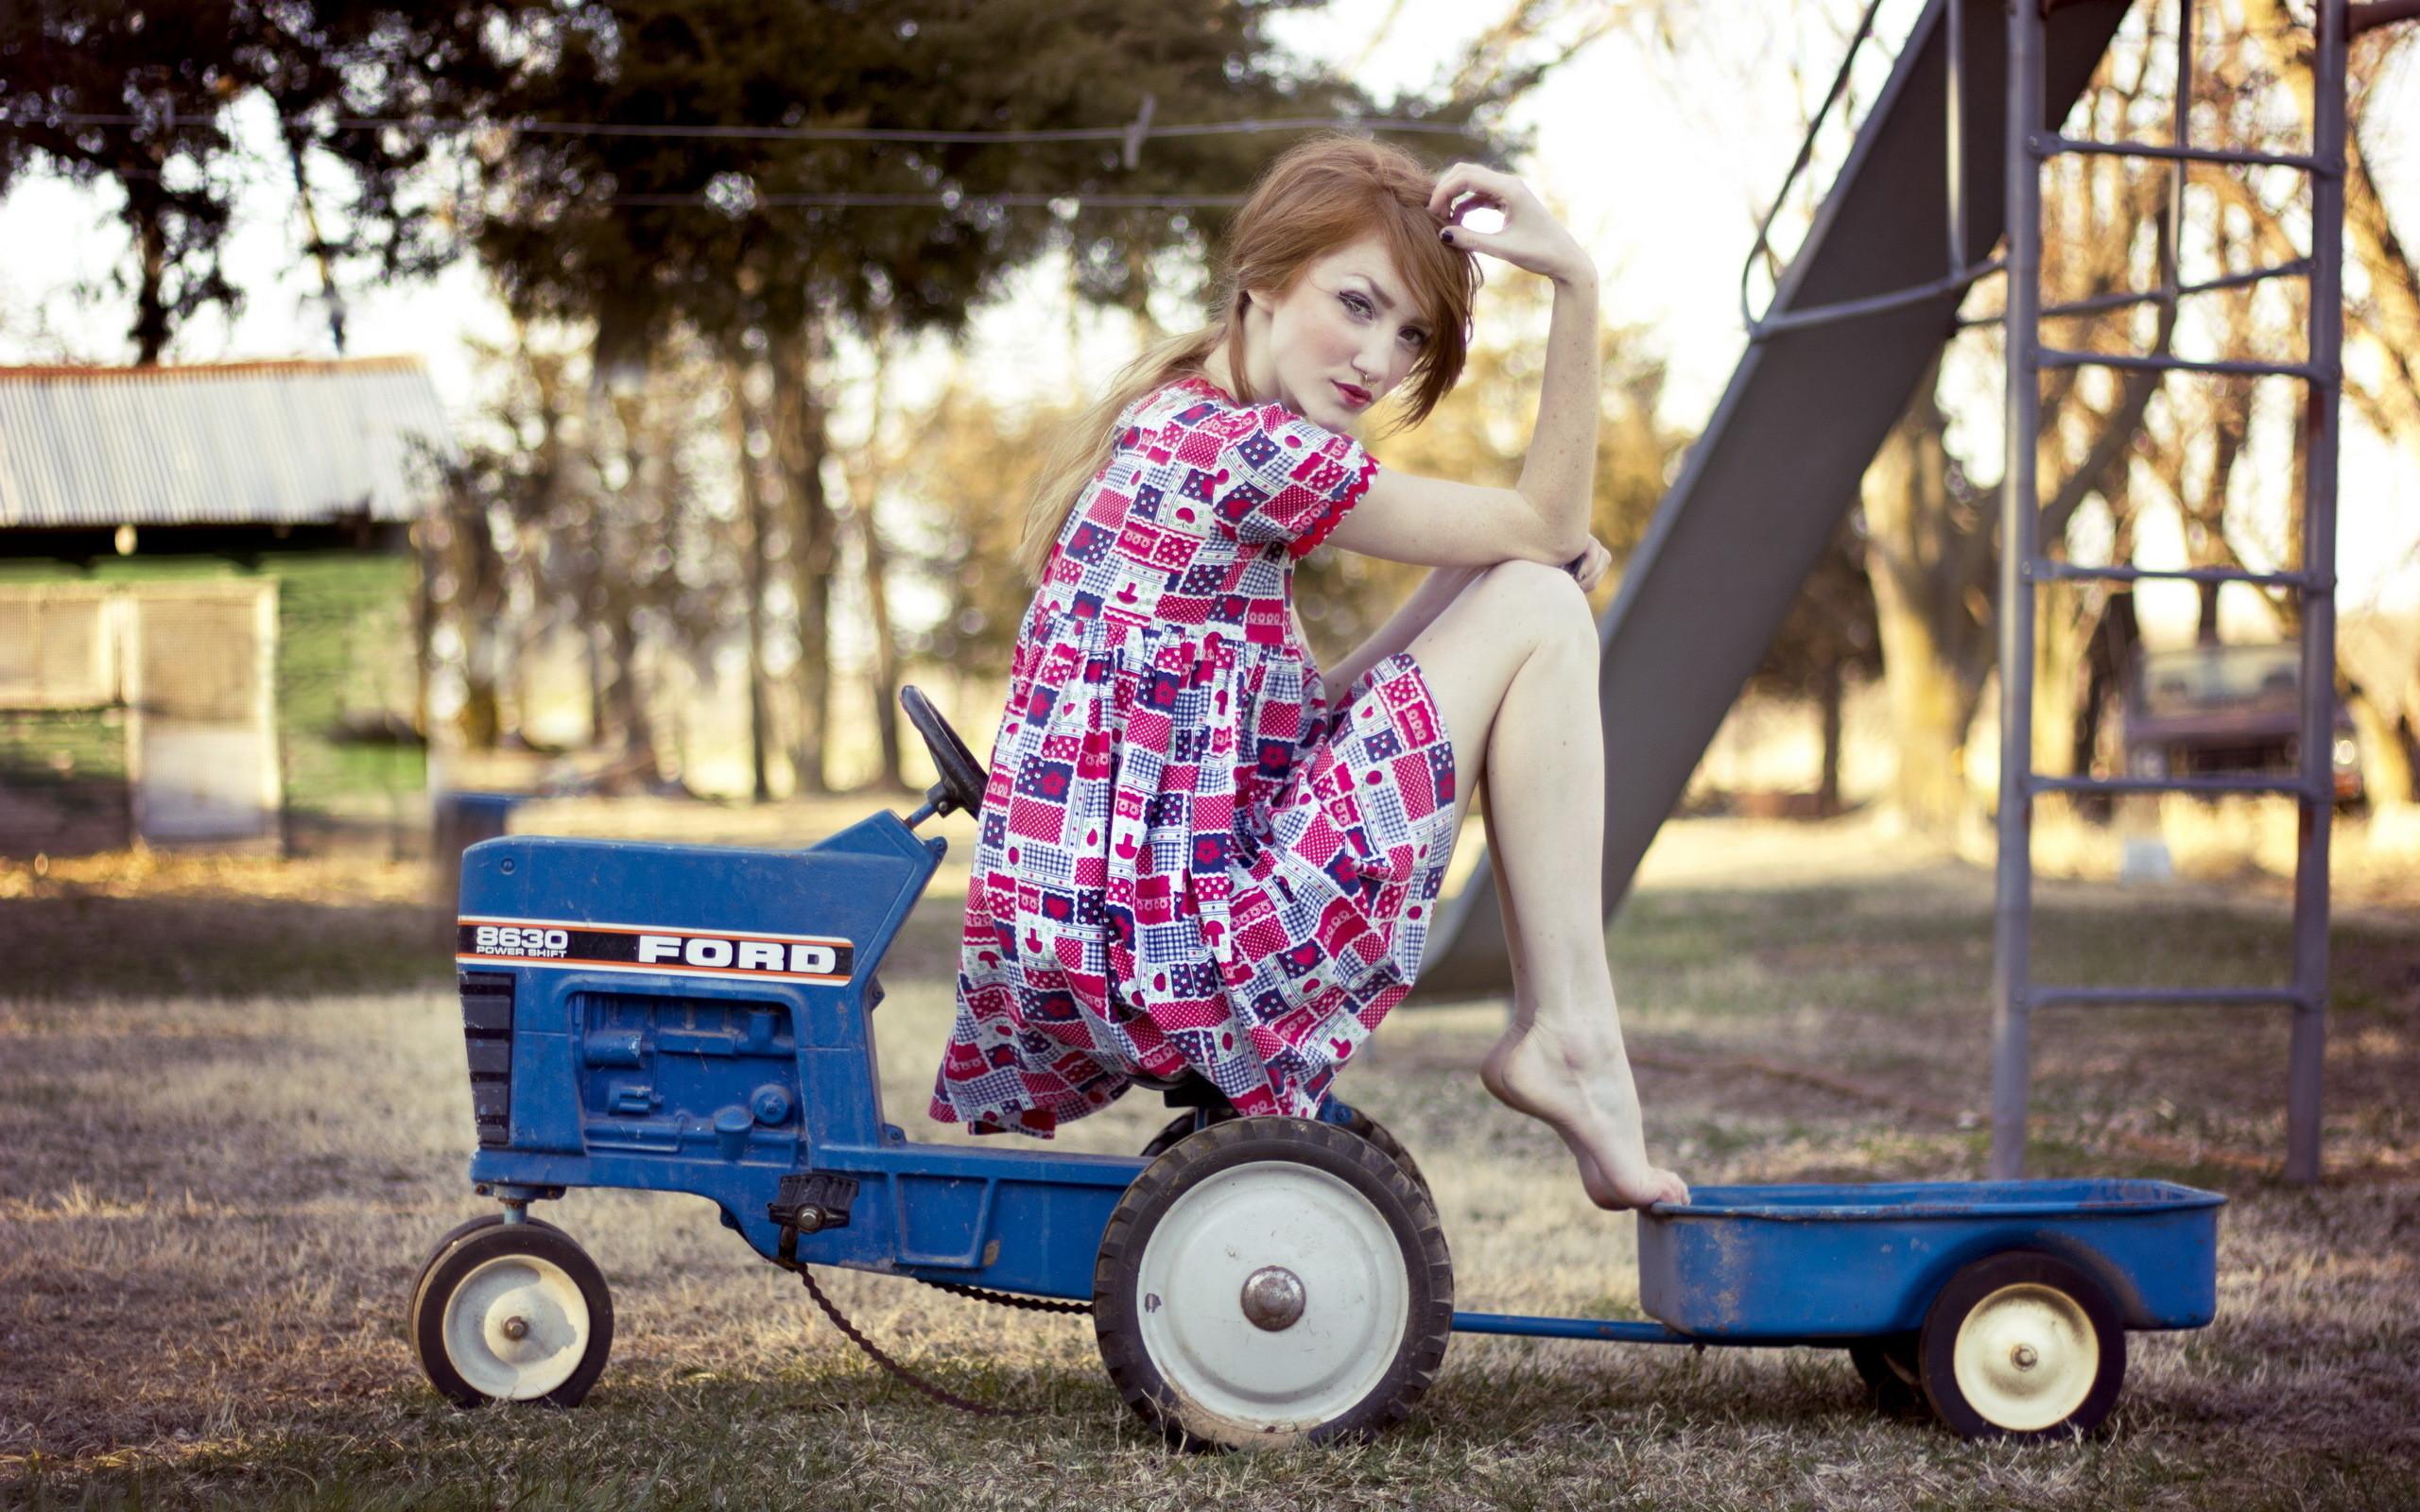 Country girl wallpapers 55 images - Jawga boyz wallpaper ...